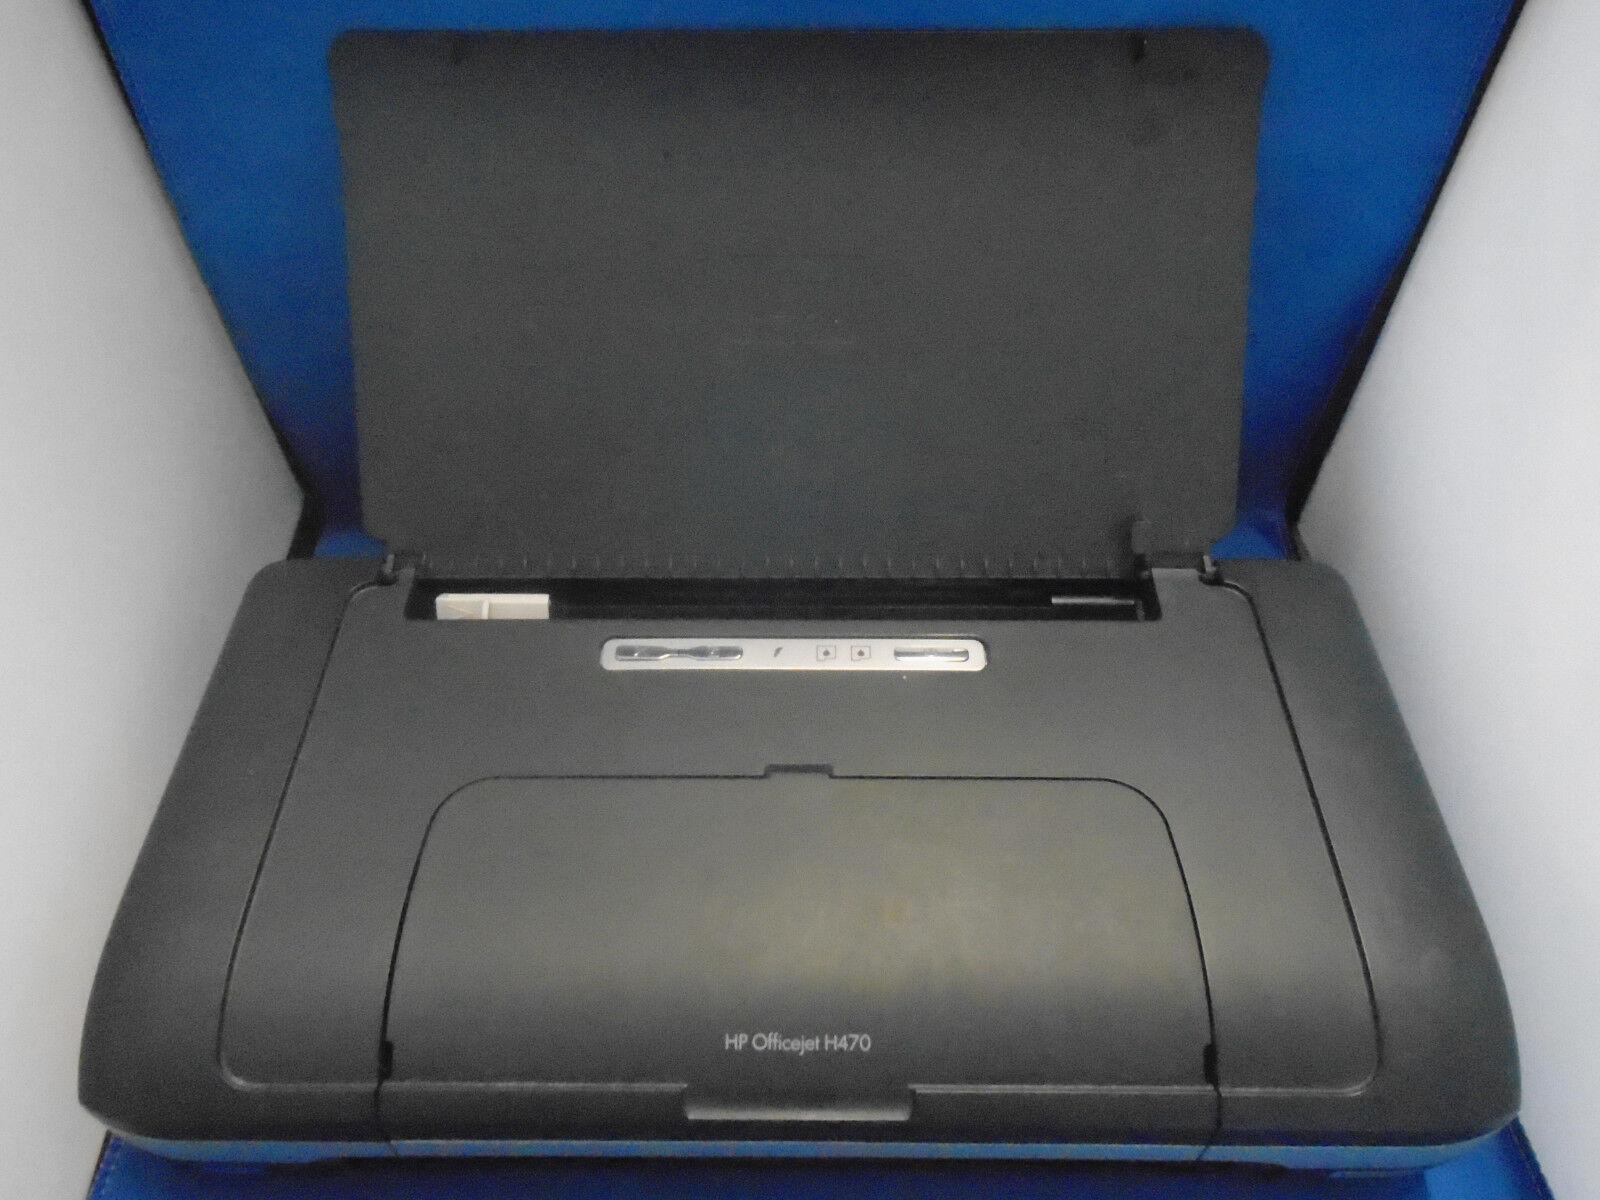 Hp officejet 470 (h470) portable usb imprimante (encre ou courant fournitures ne